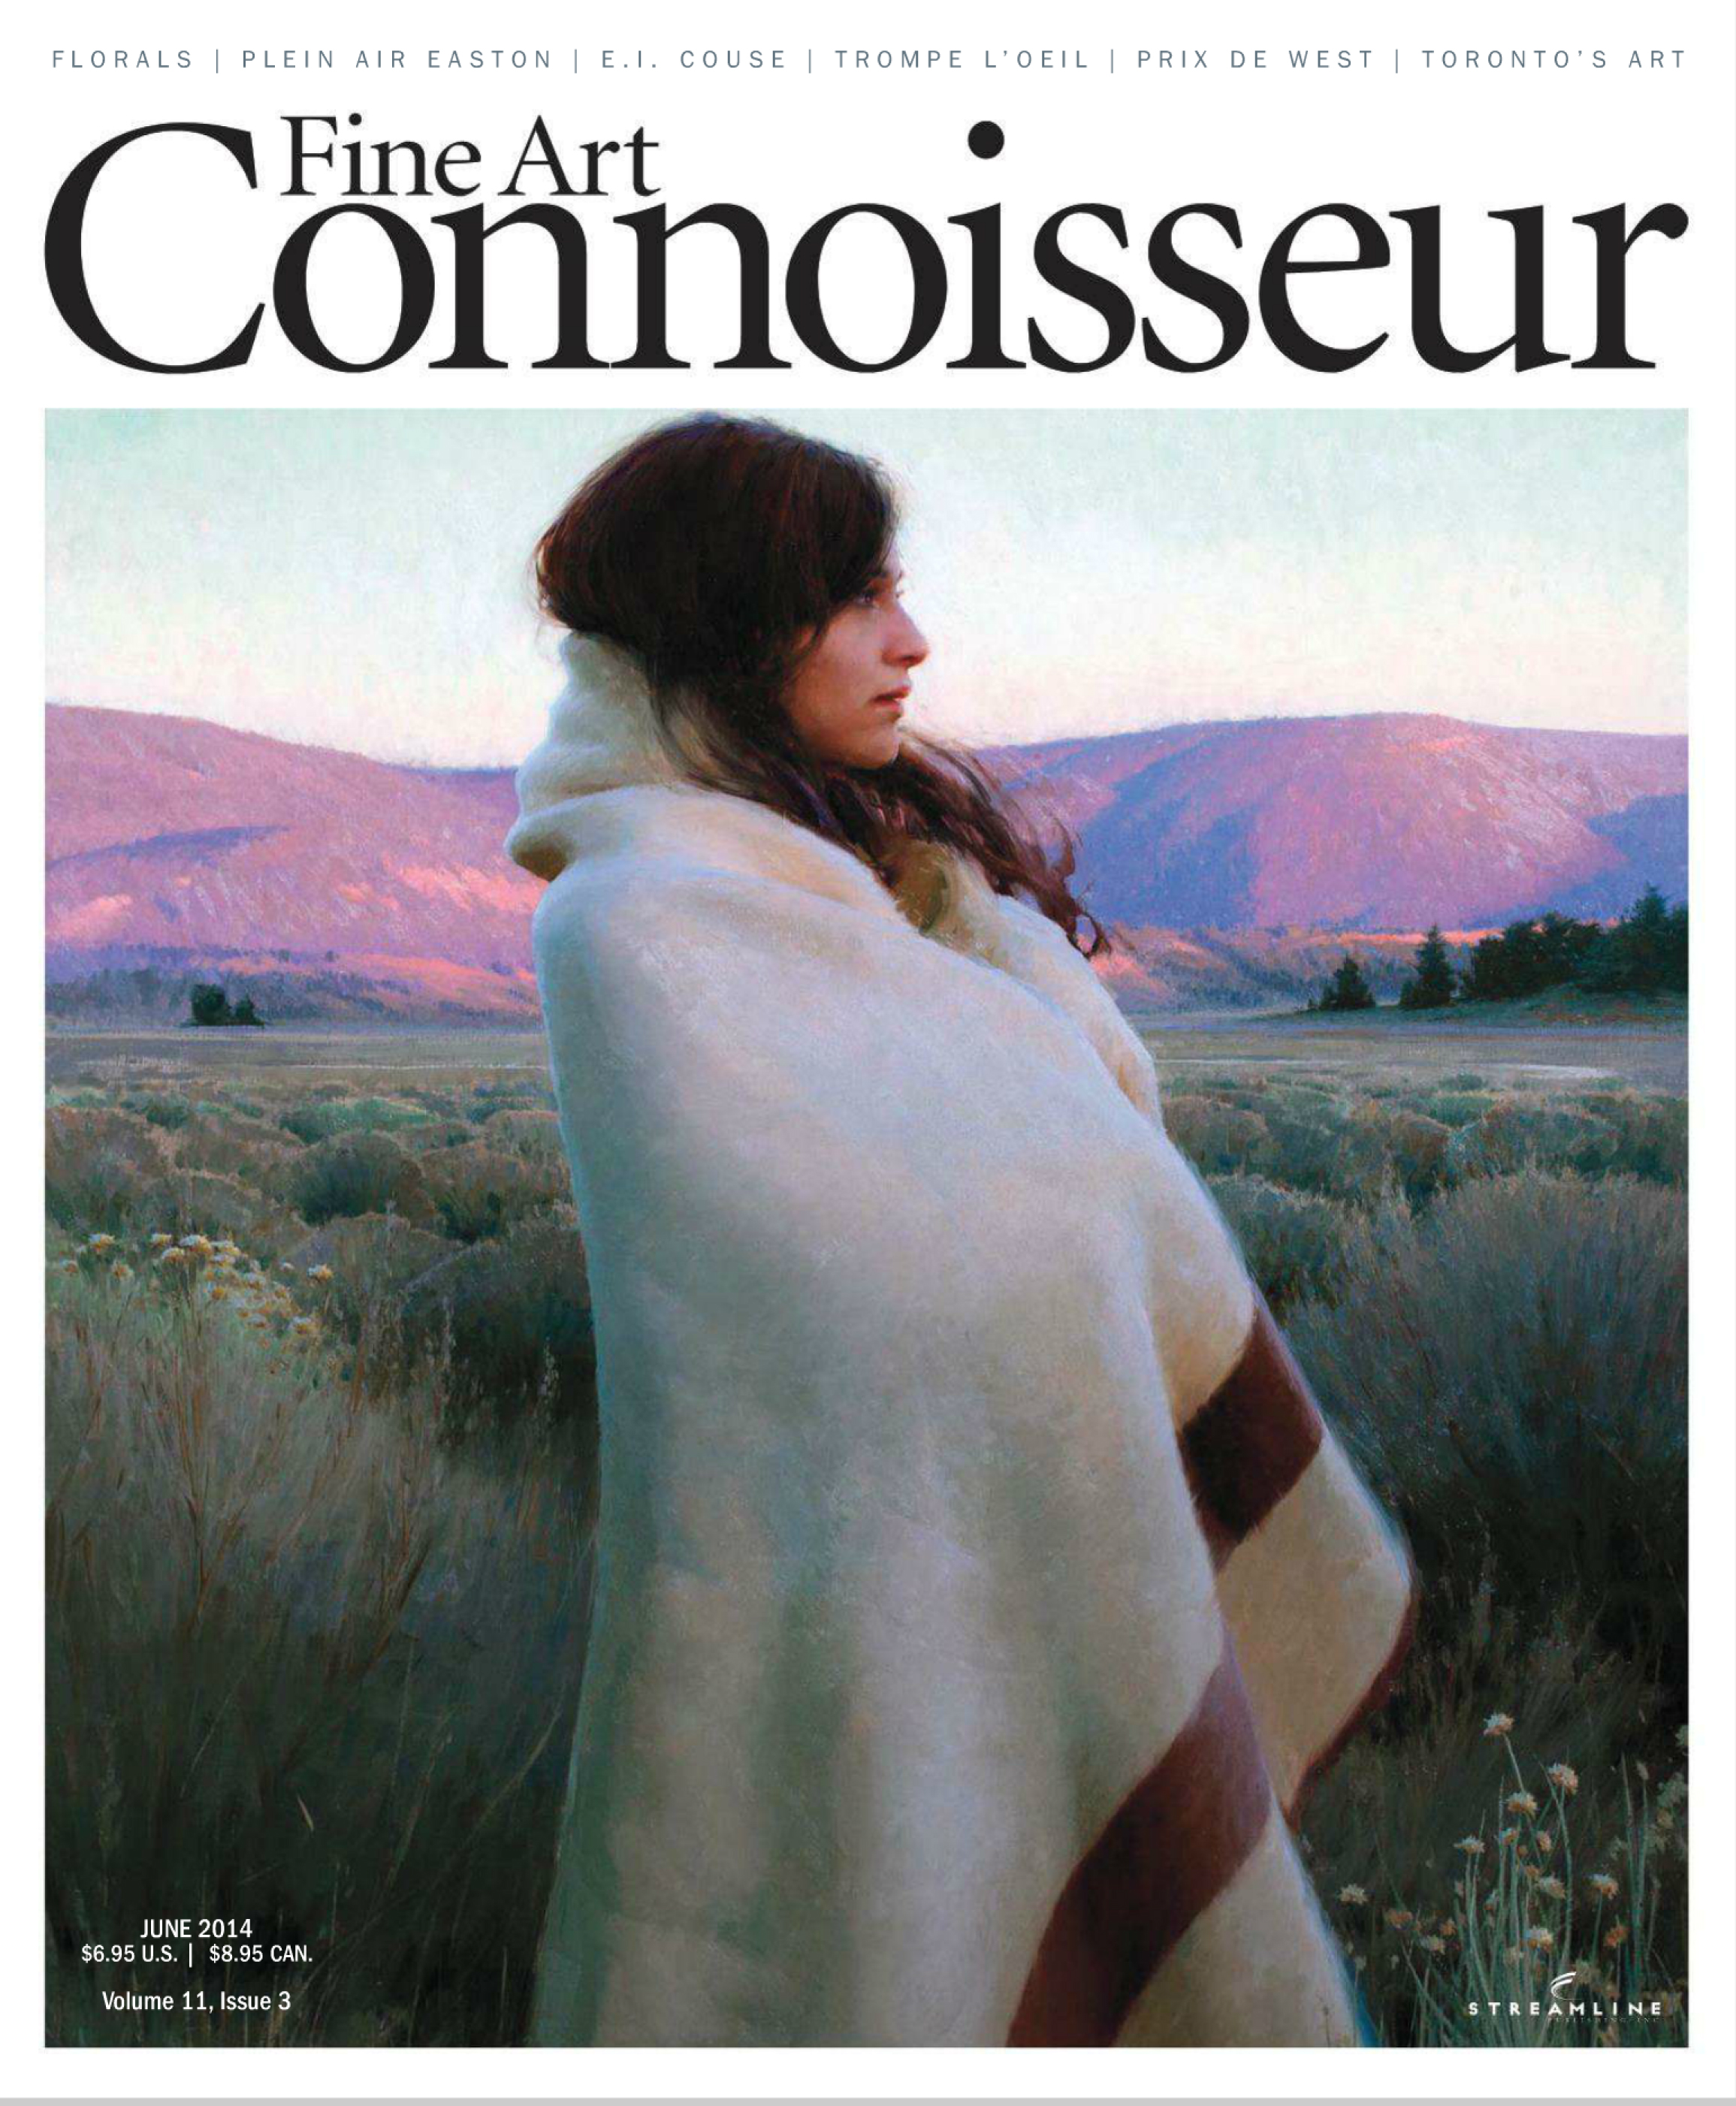 June 2014, Volume 11, Issue 3